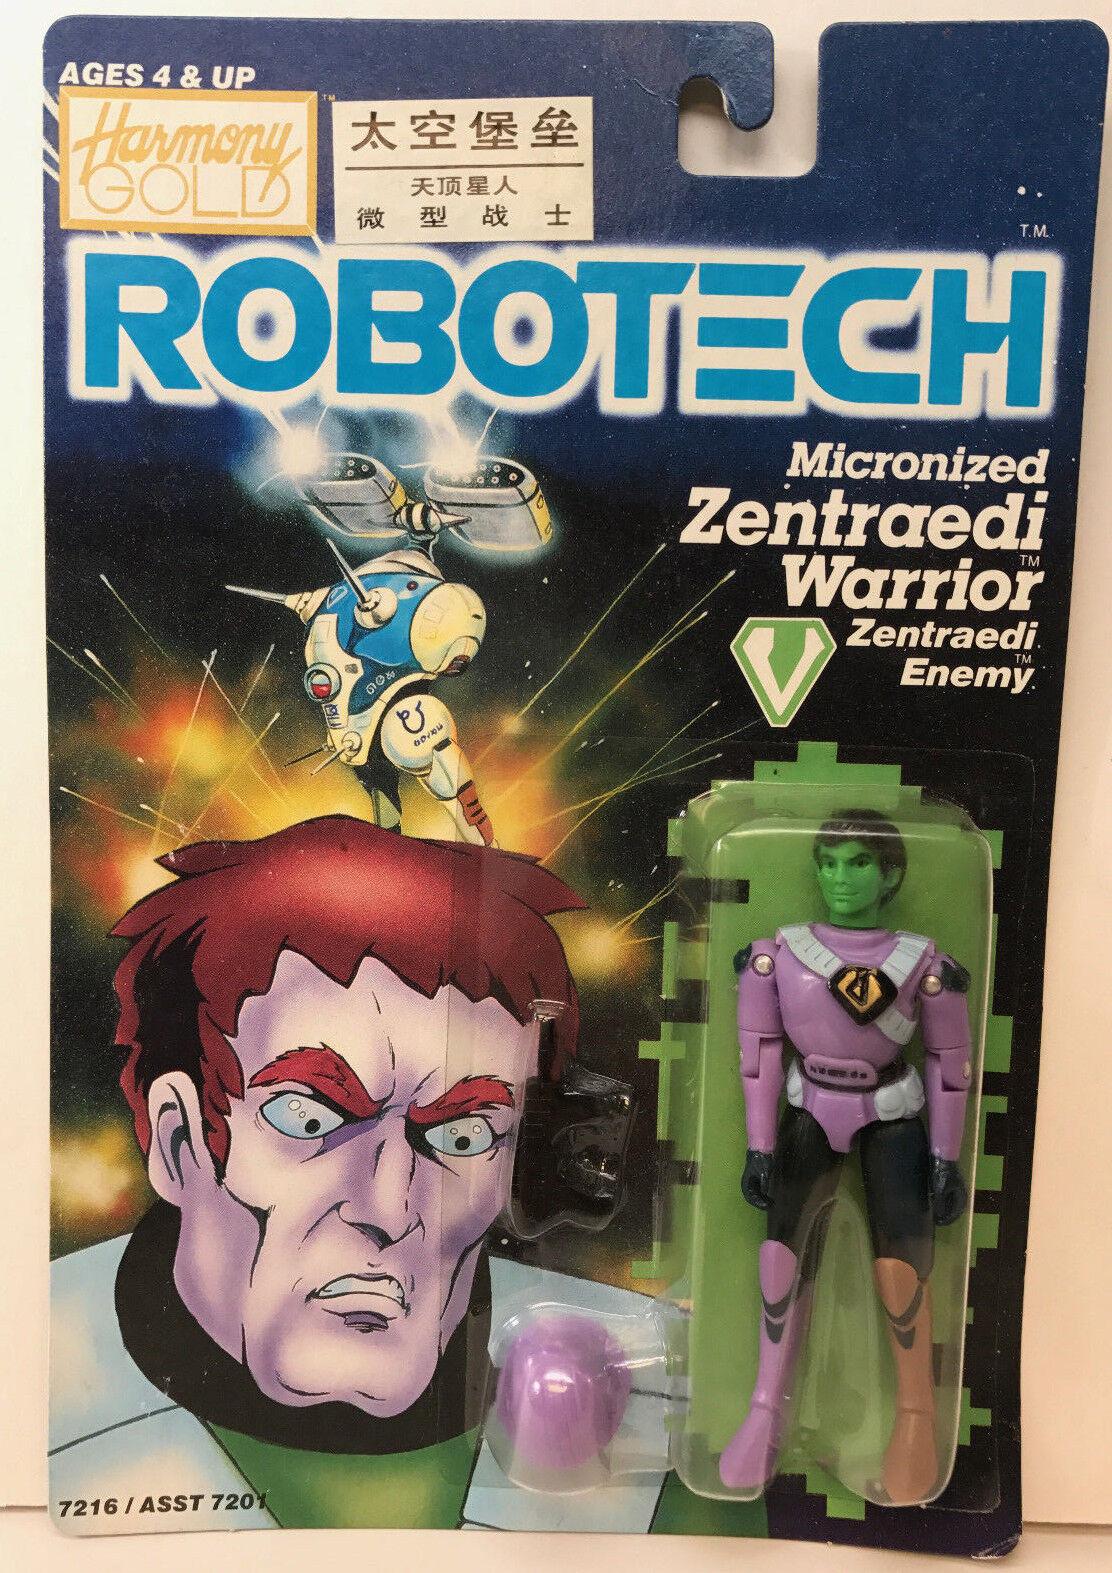 1985 MATCHBOX ROBOTECH MICRONIZED ZENTRAEDI WARRIOR FIGURE SEALED